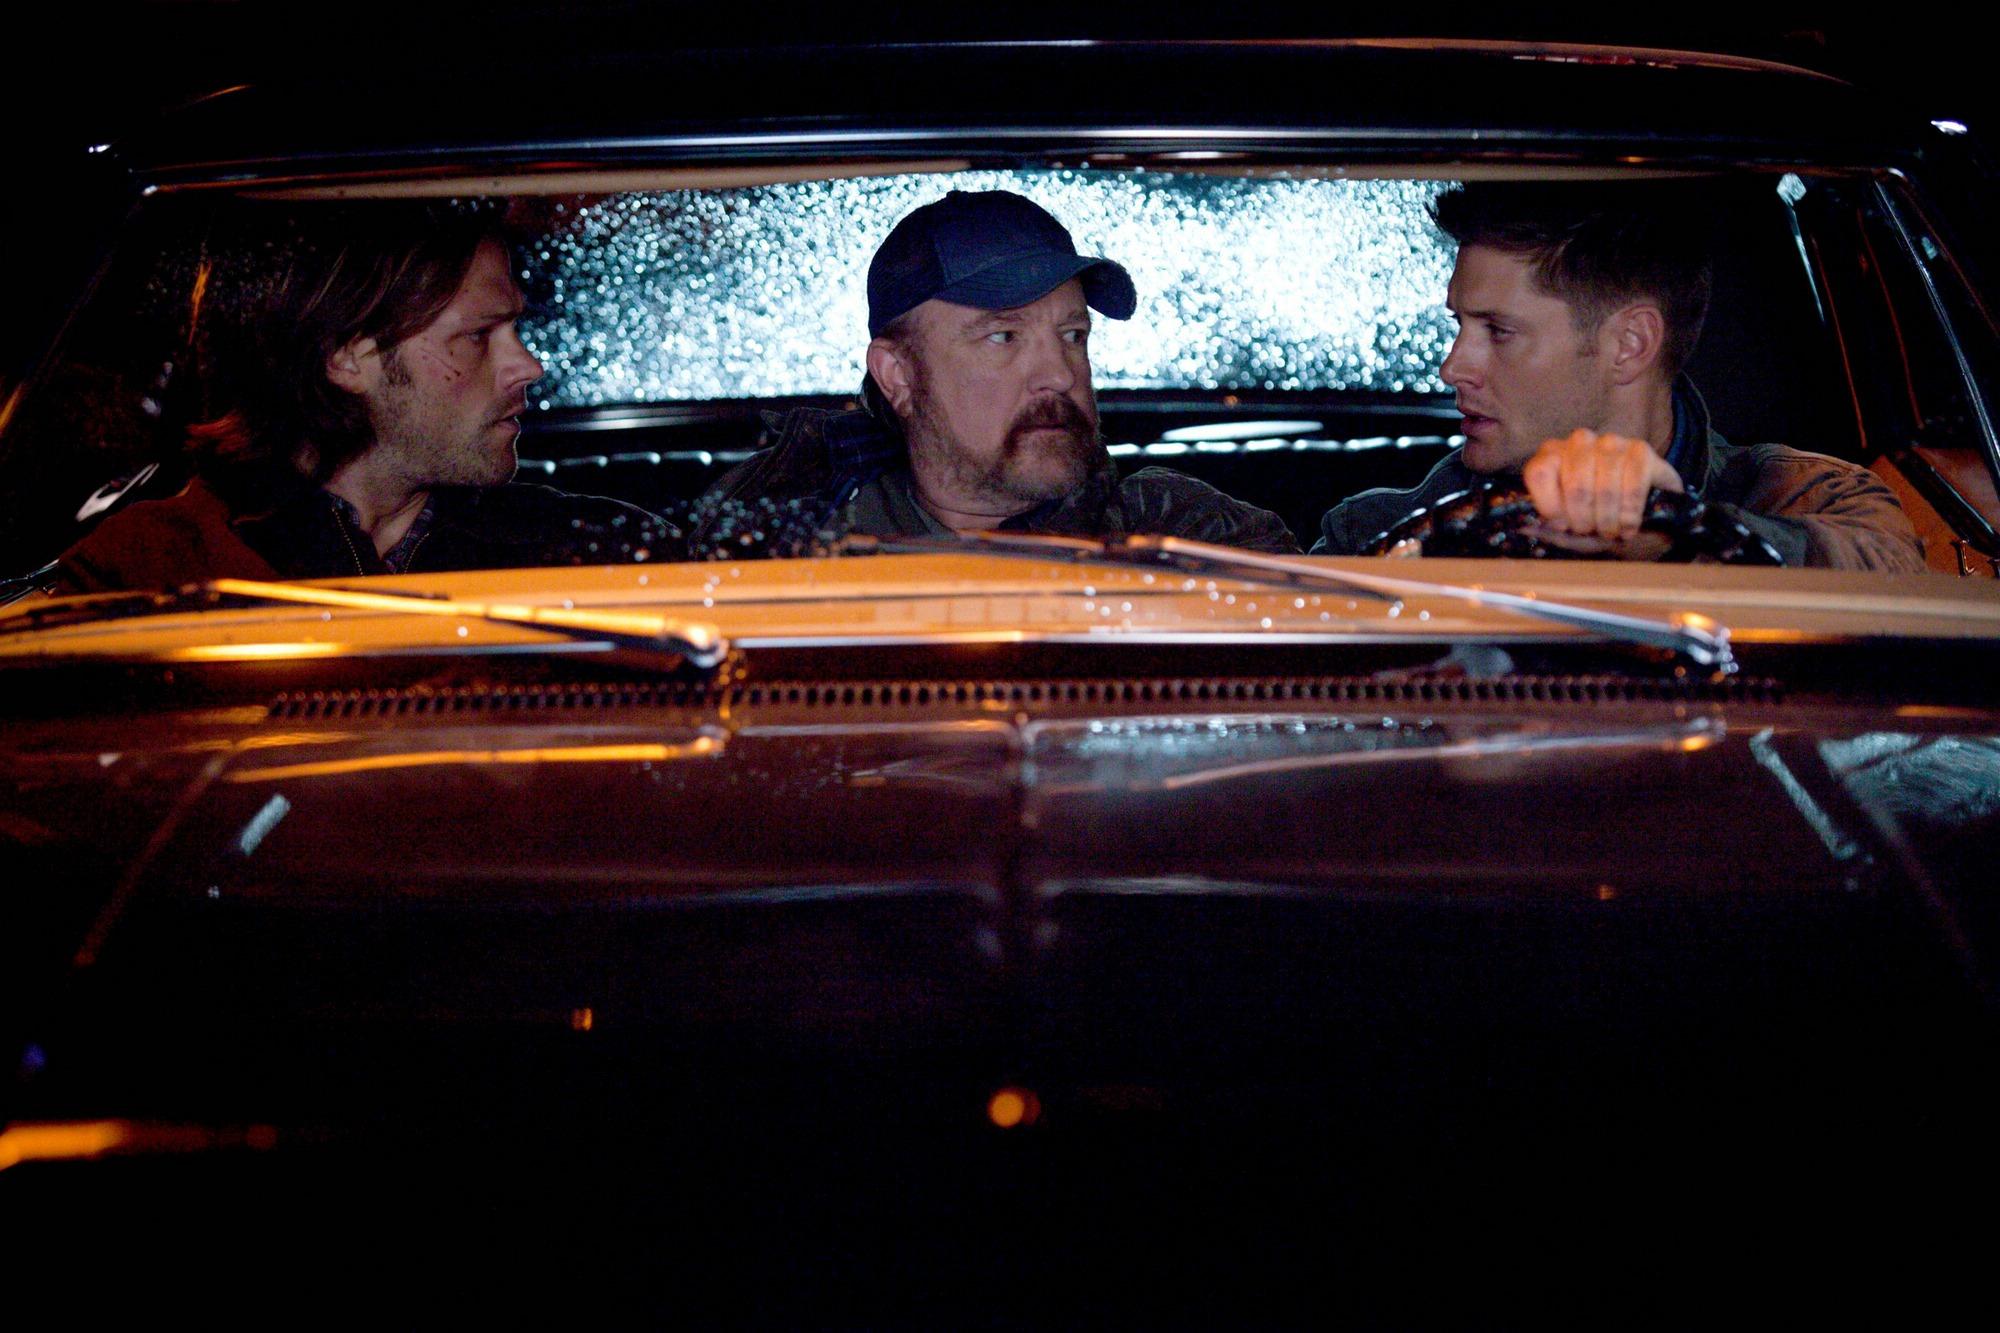 Supernatural Episode 9.01 - Press Release, Promos, HQ Promo Stills, Jared Tweet Summary